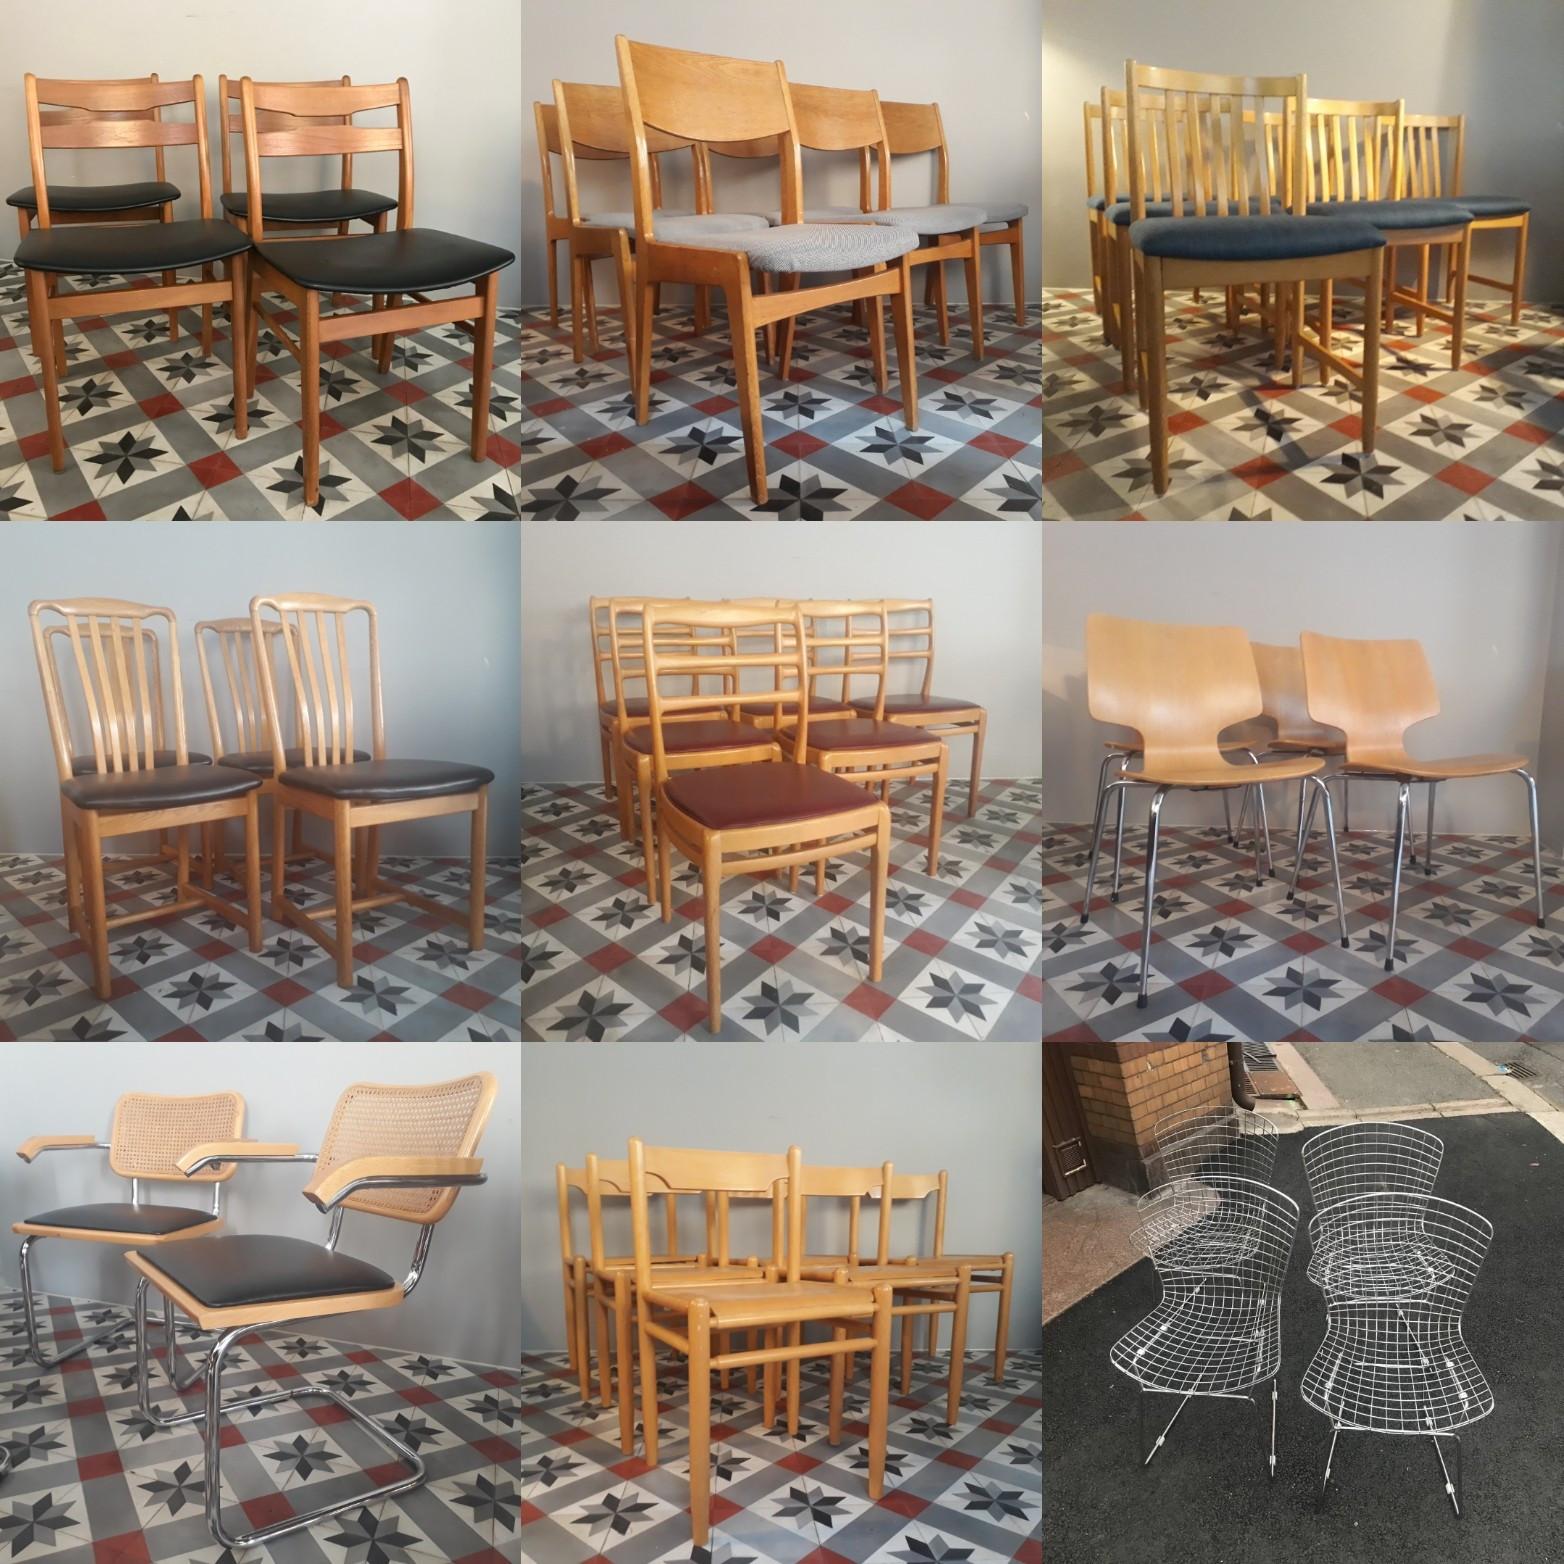 Vintage talienske Chiavari stoler | FINN.no